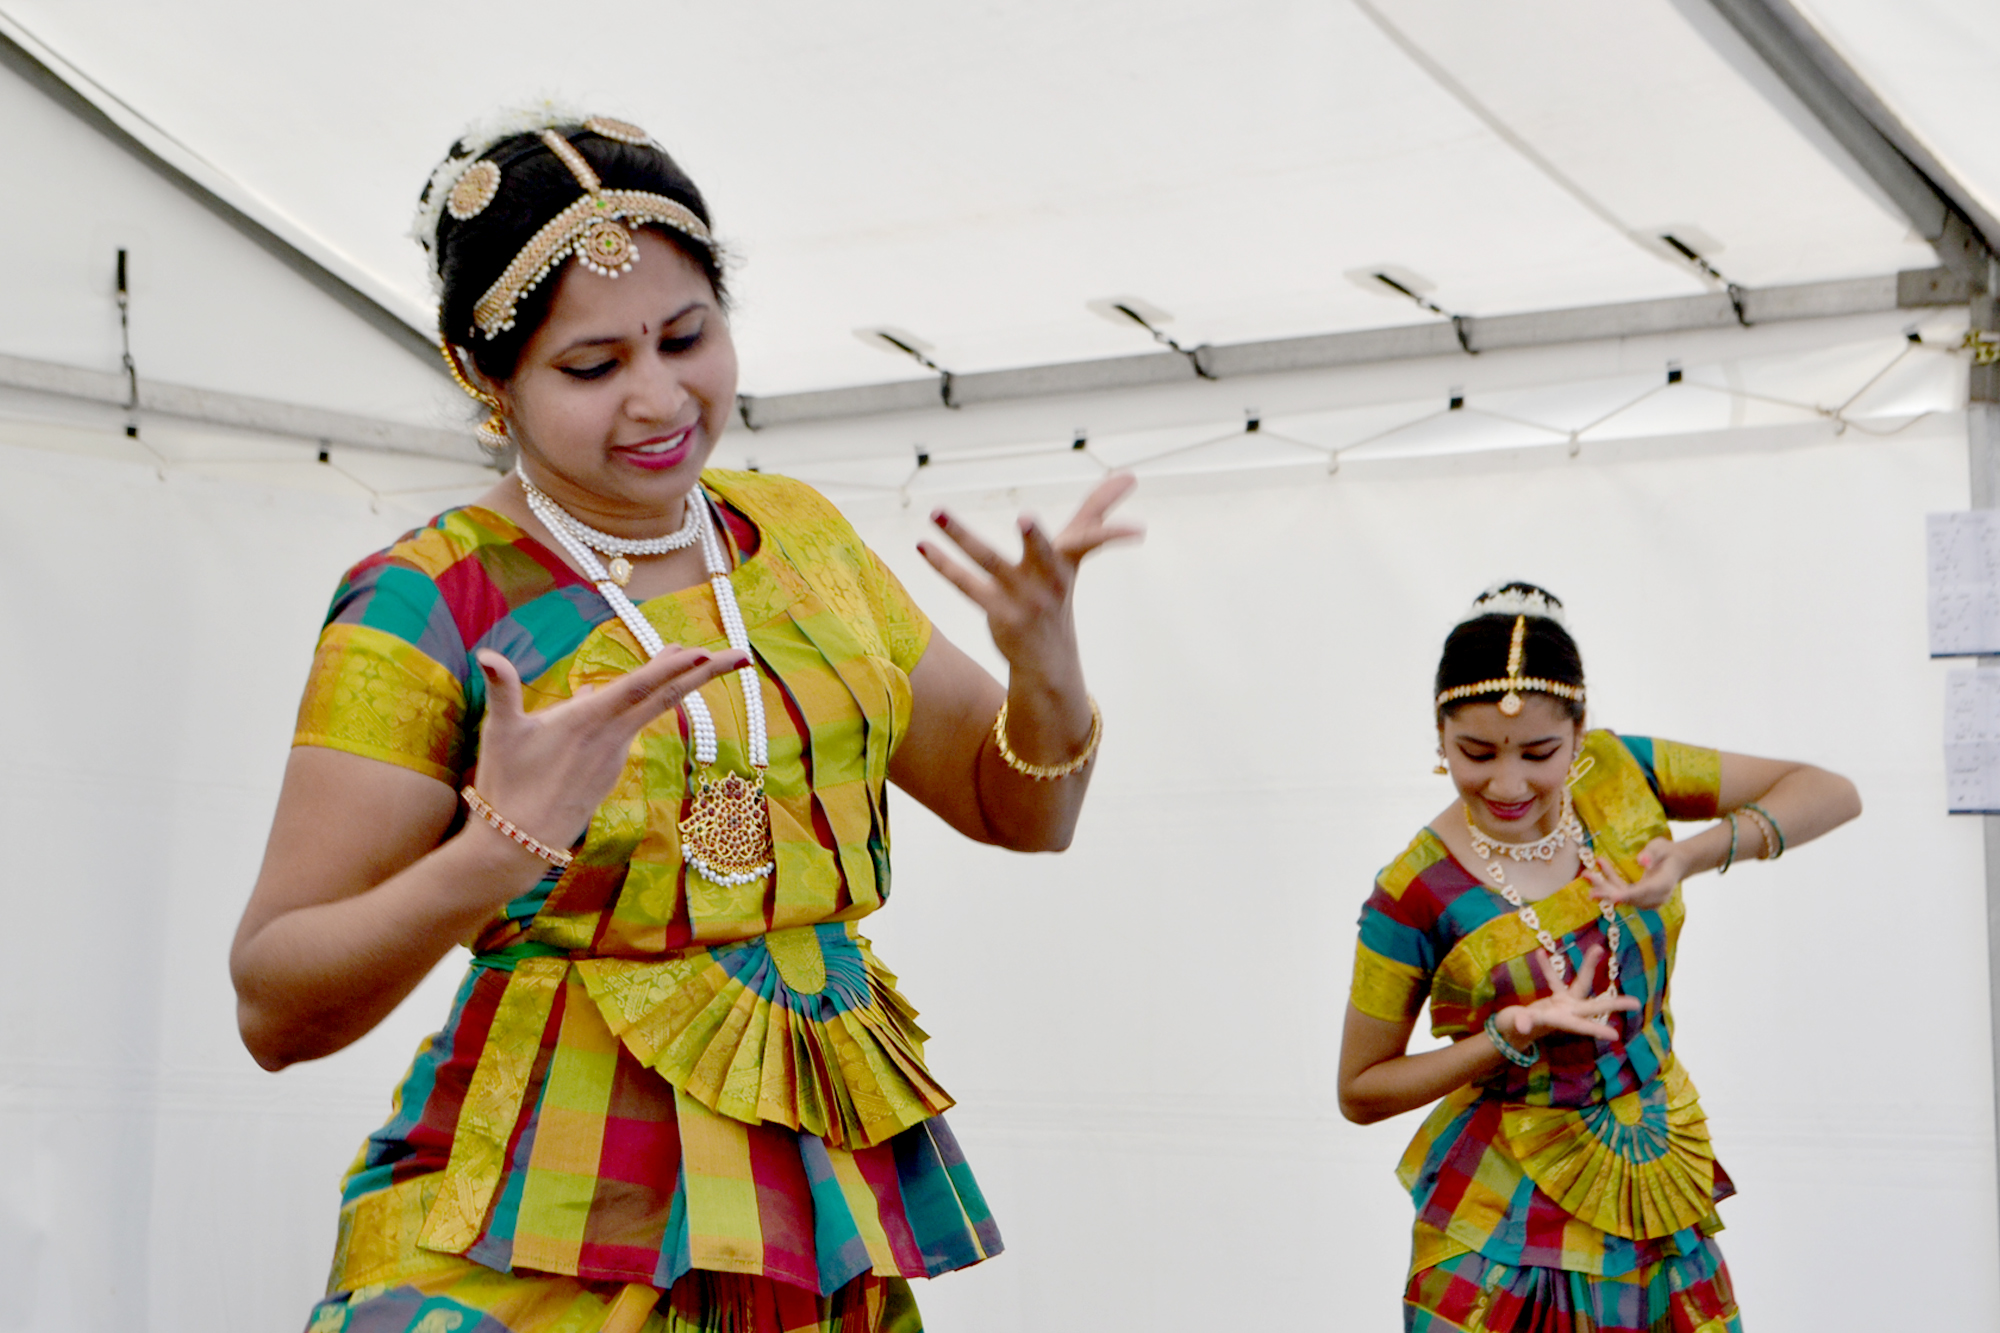 Diwali2016-21-medres.jpg